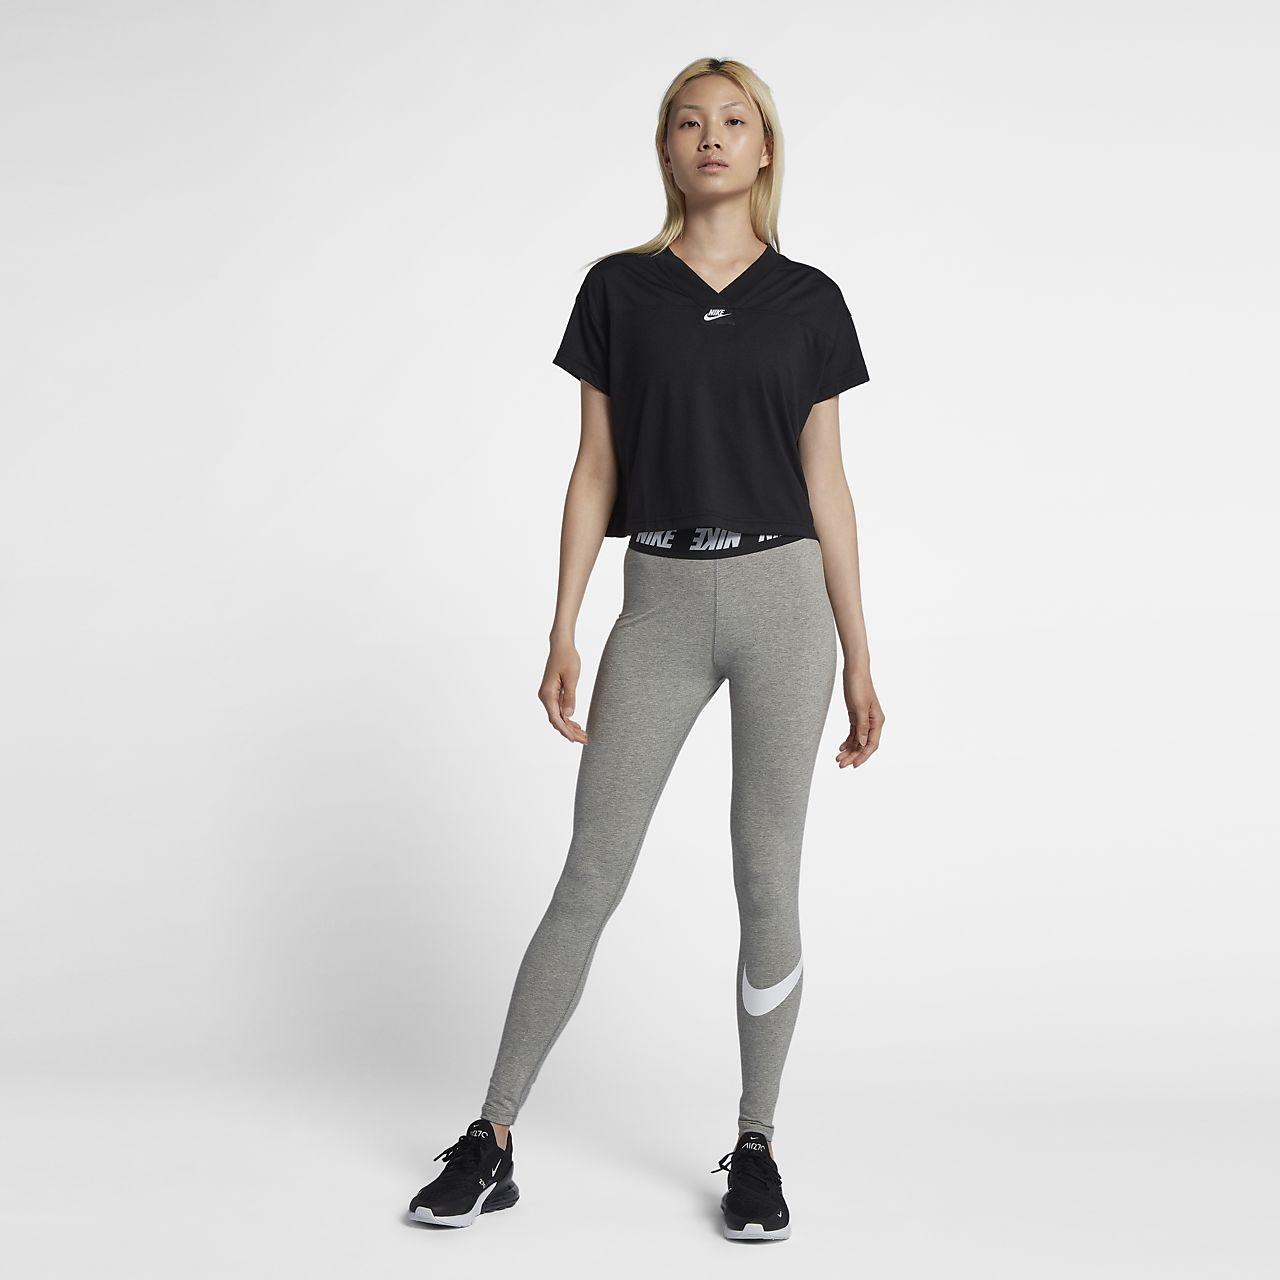 4e93259e7fc5ab Nike Sportswear Club Women's High-Rise Leggings. Nike.com GB